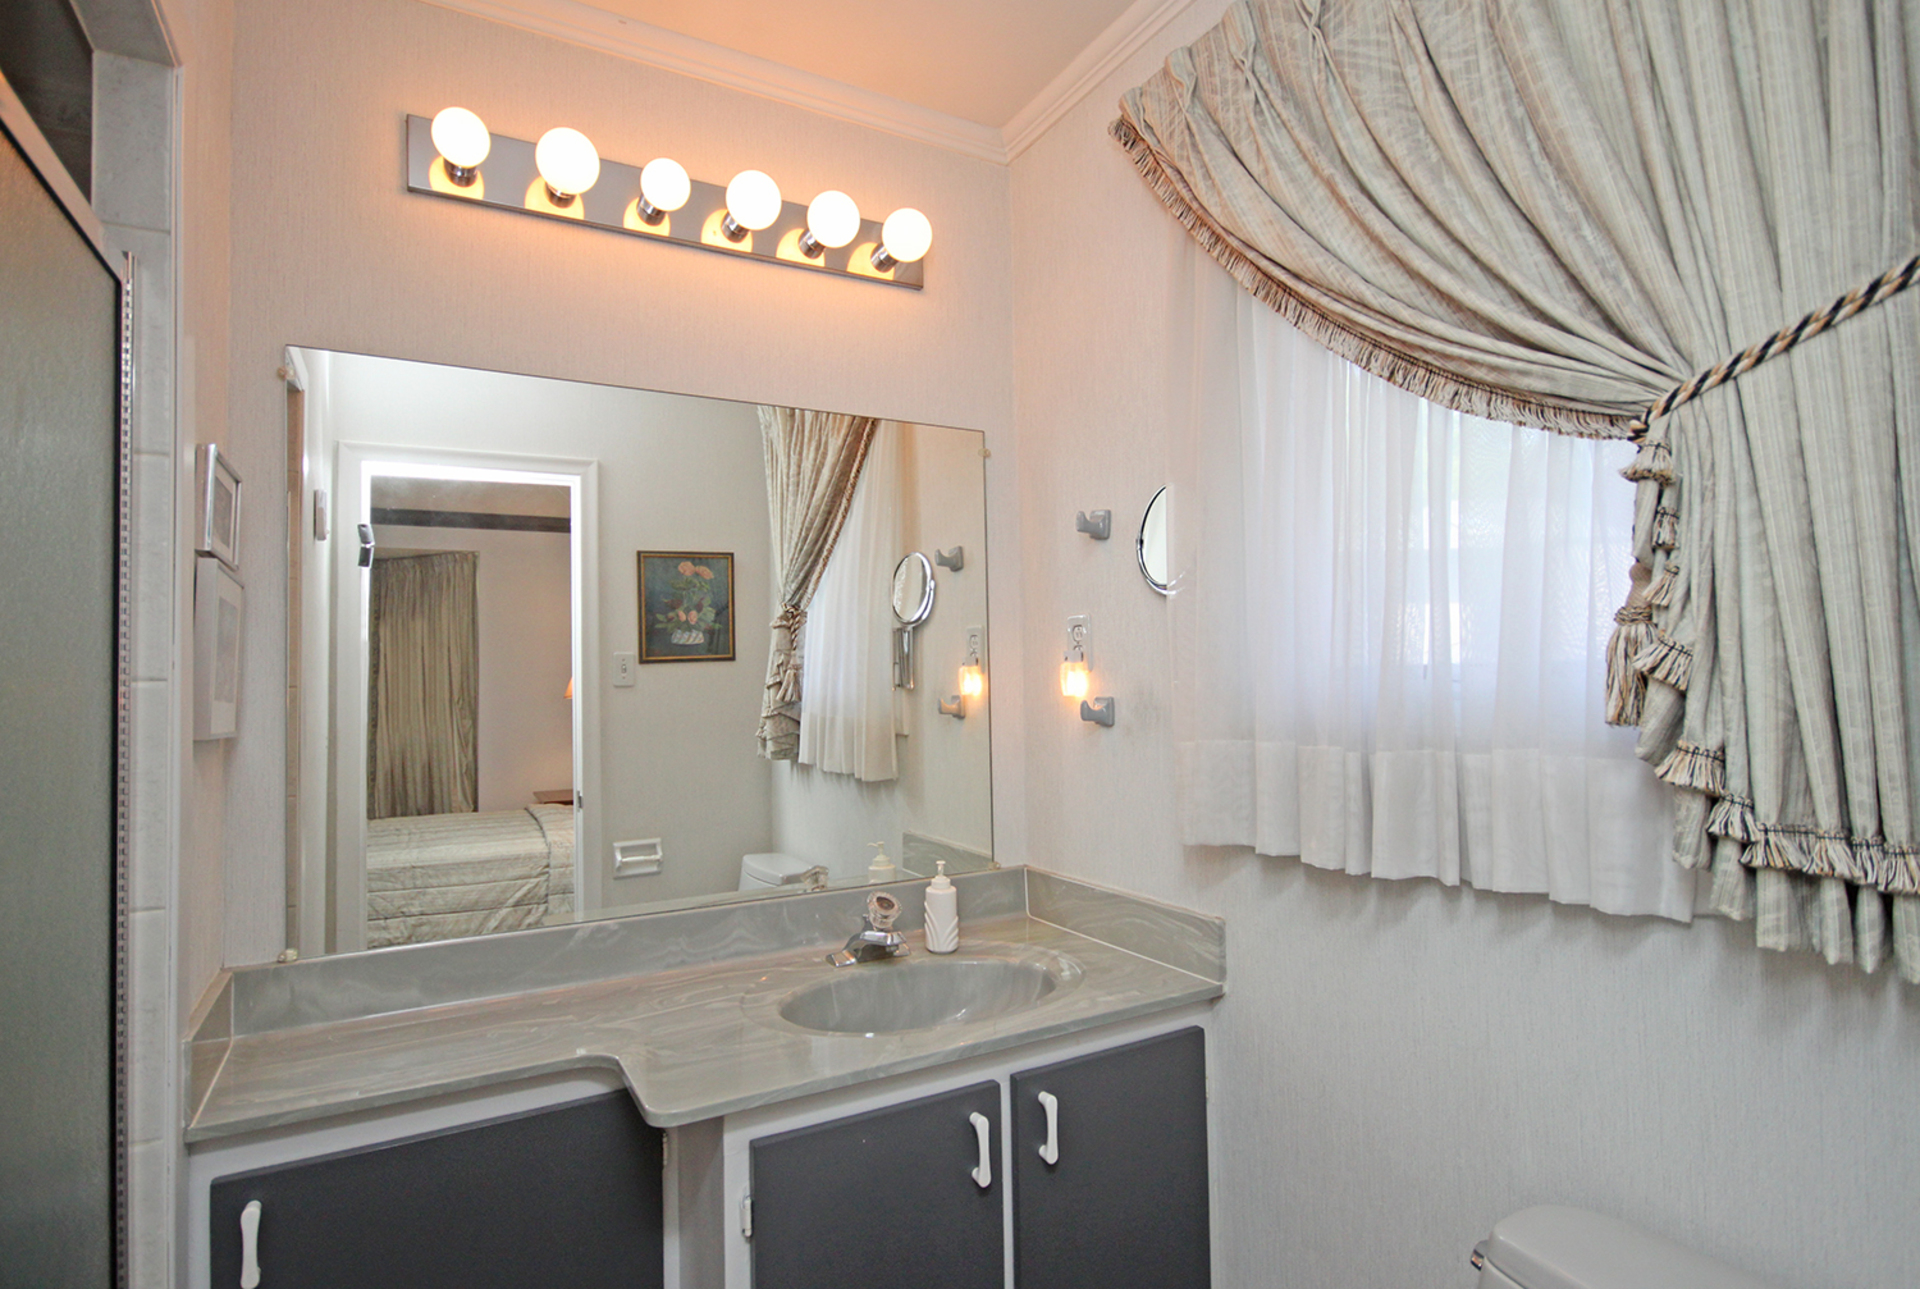 3 Piece Ensuite Bathroom at 9 Sandpiper Court, Parkwoods-Donalda, Toronto